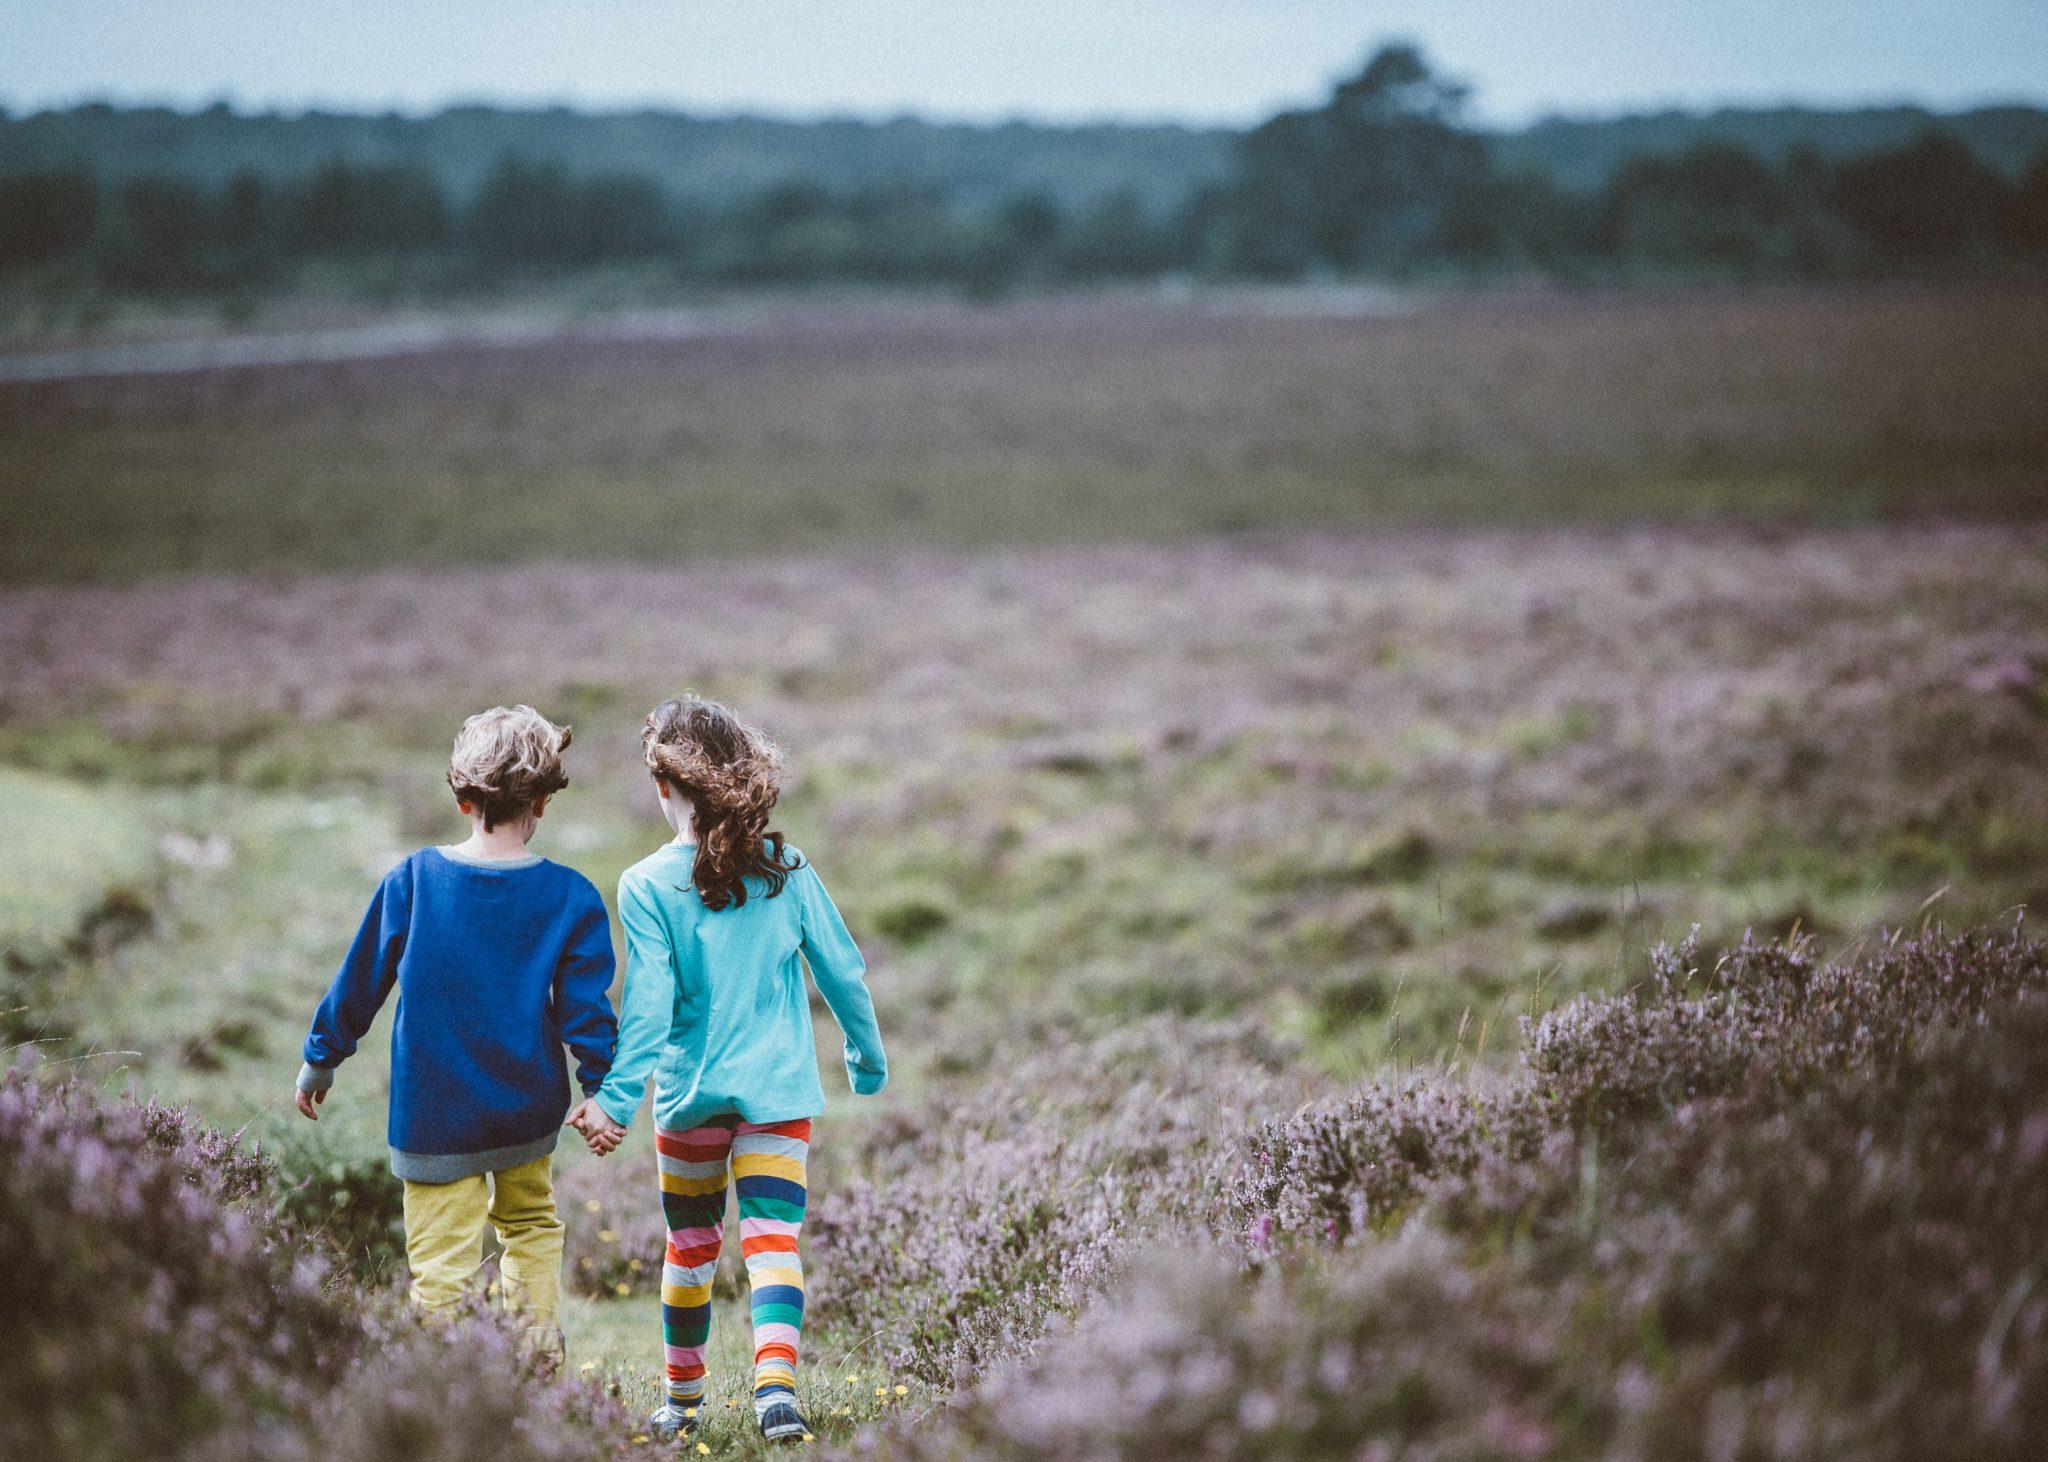 children walking outdoors